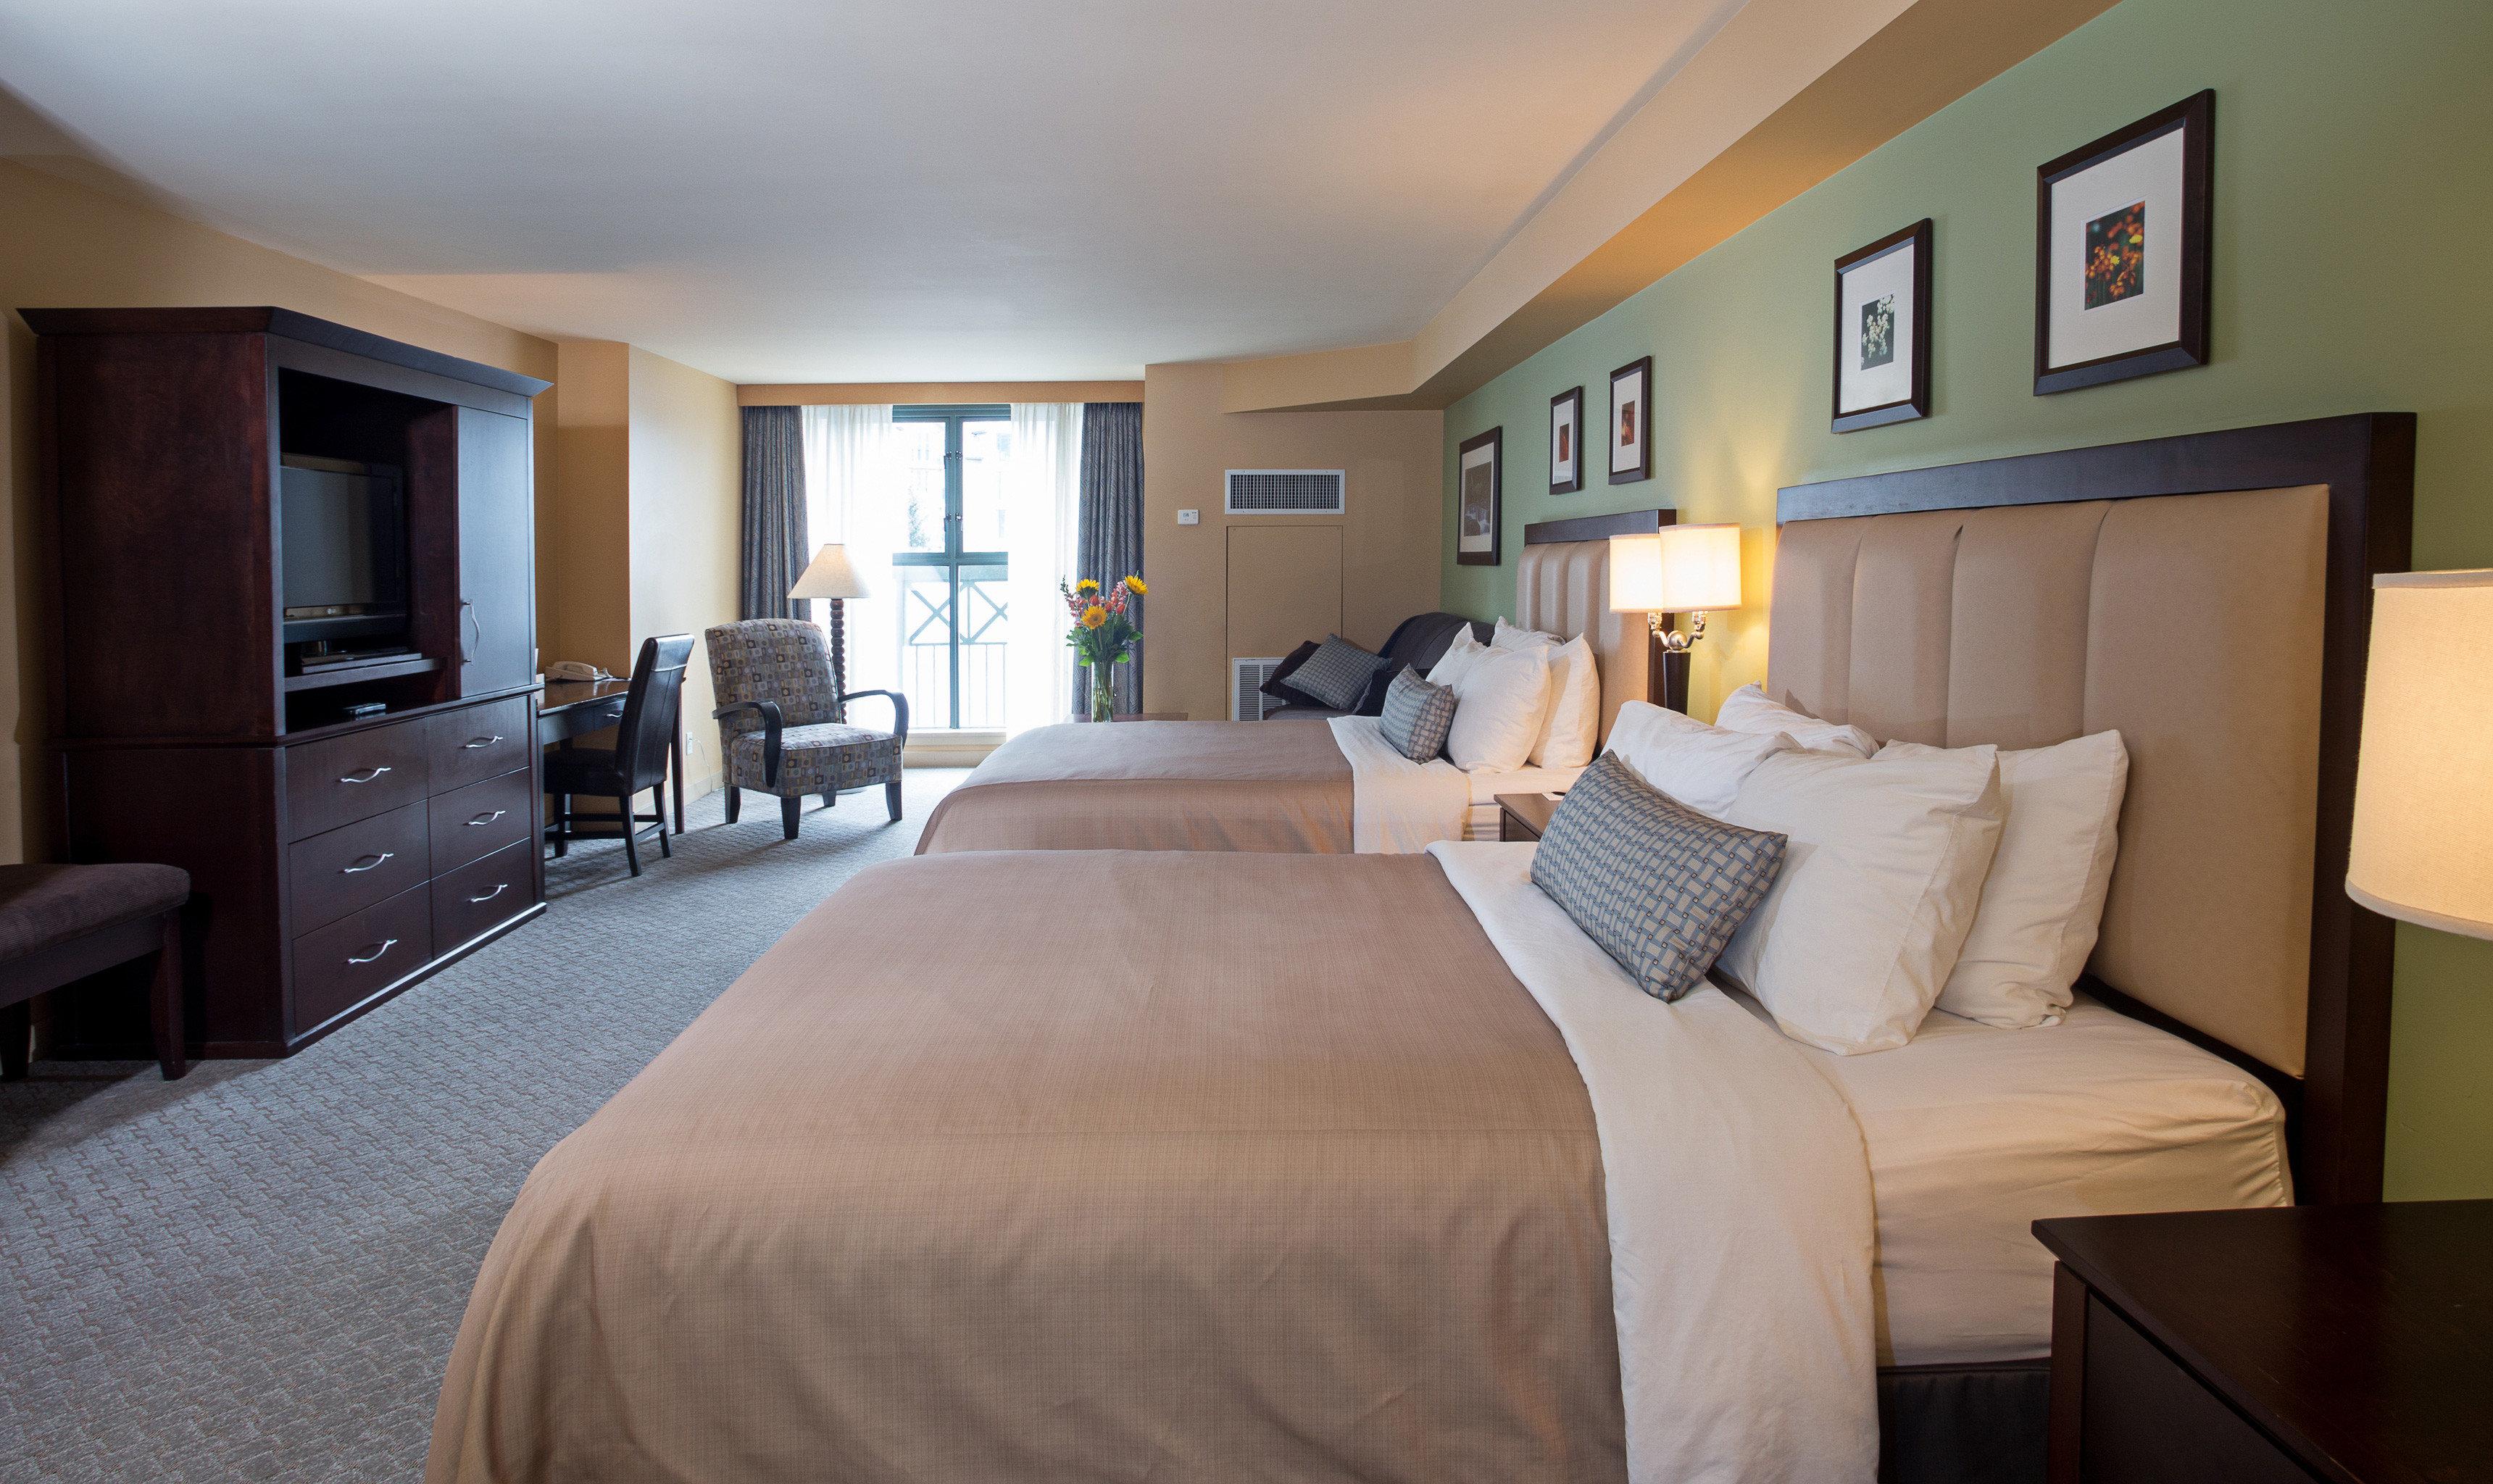 Bedroom Lodge Lounge Scenic views sofa property Suite home cottage living room condominium Villa lamp flat